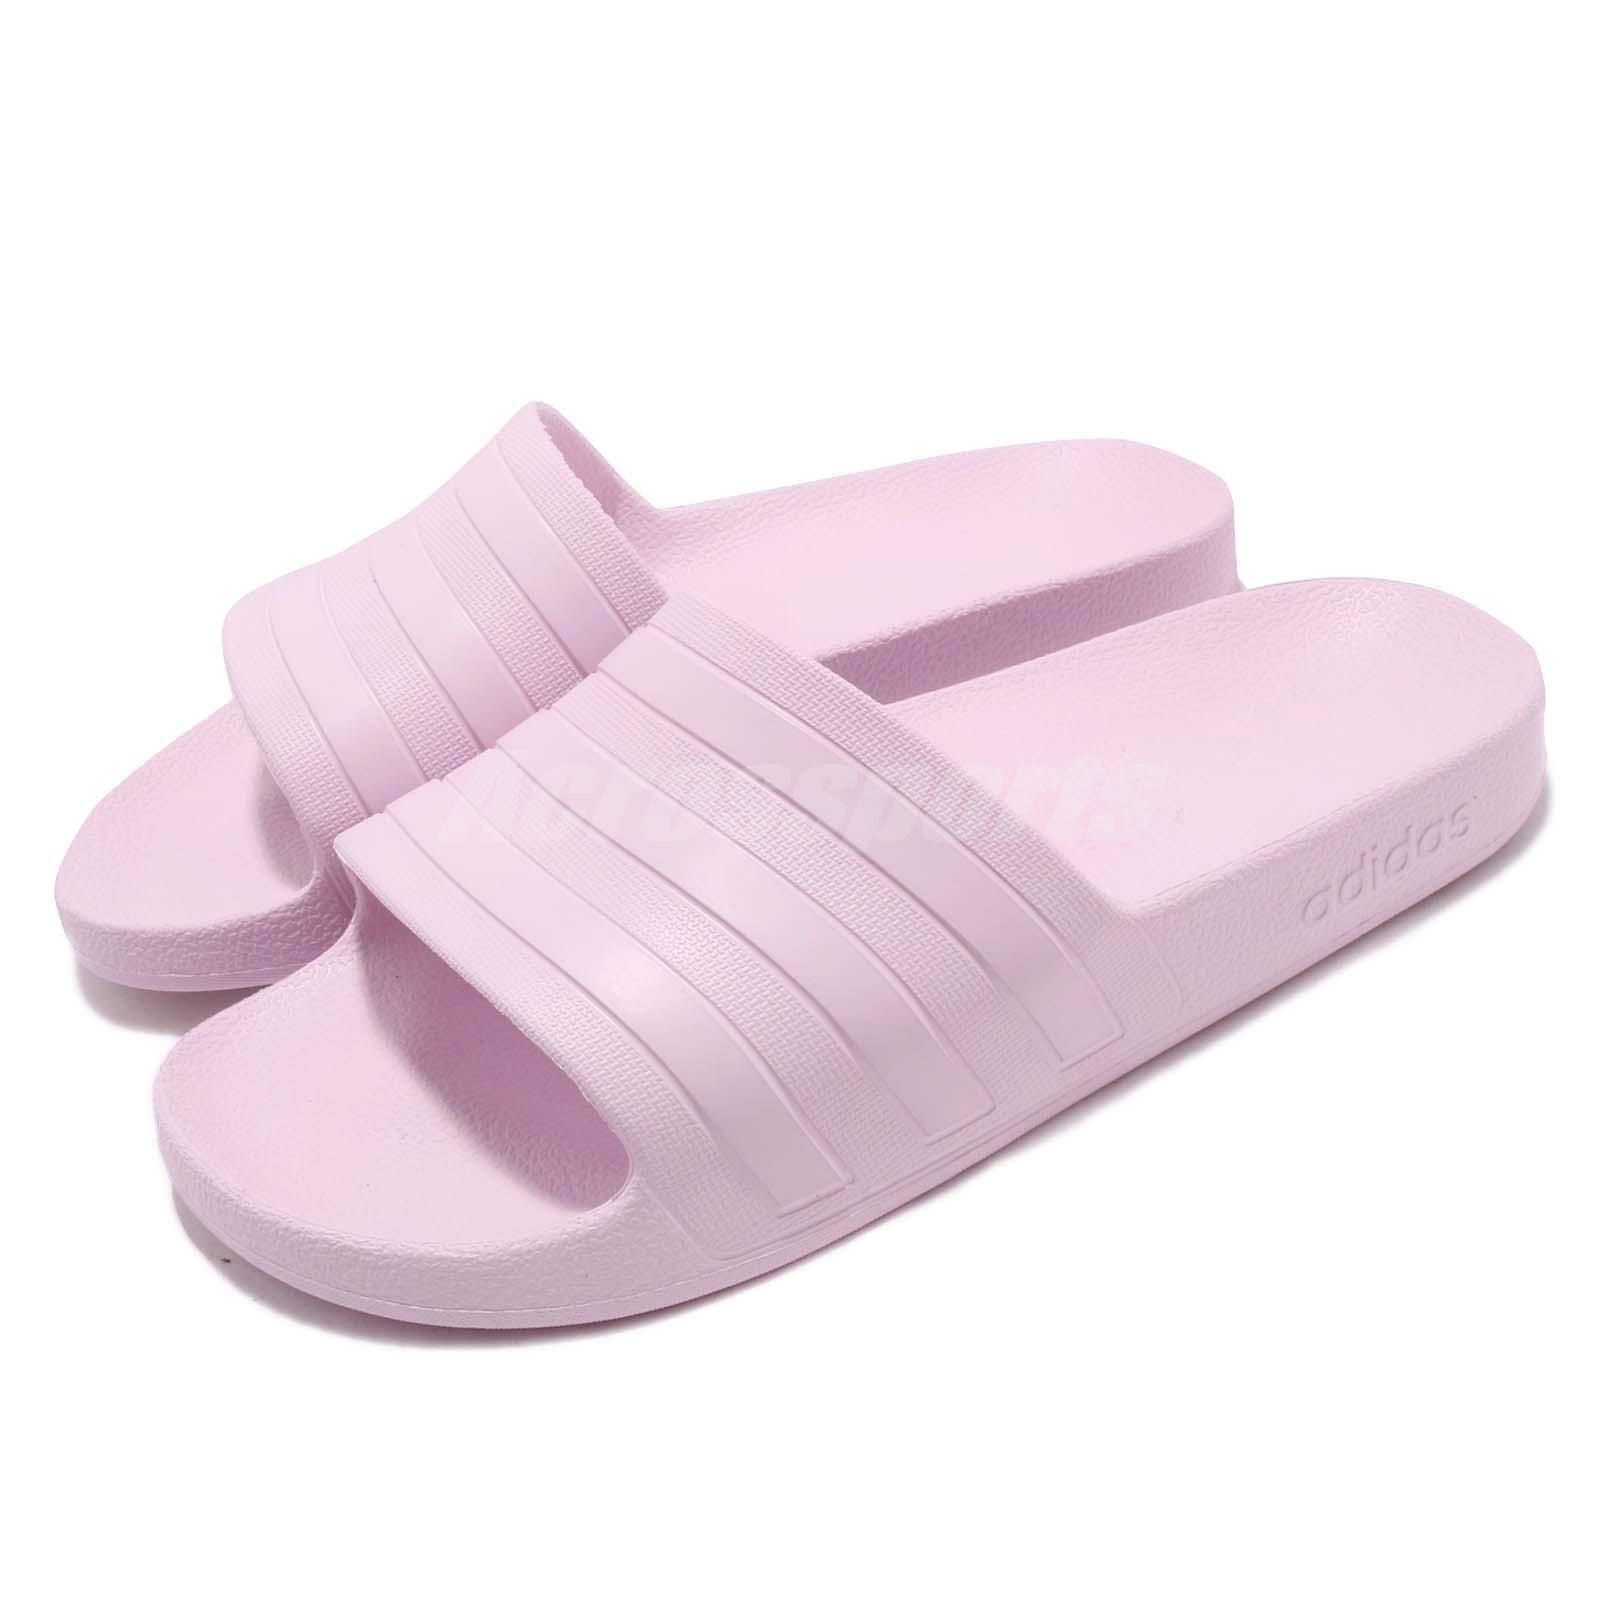 Tableta condón La nuestra  adidas Adilette Aqua Slides Aero Pink Men Women Sports Sandals Slippers  F35547 | eBay